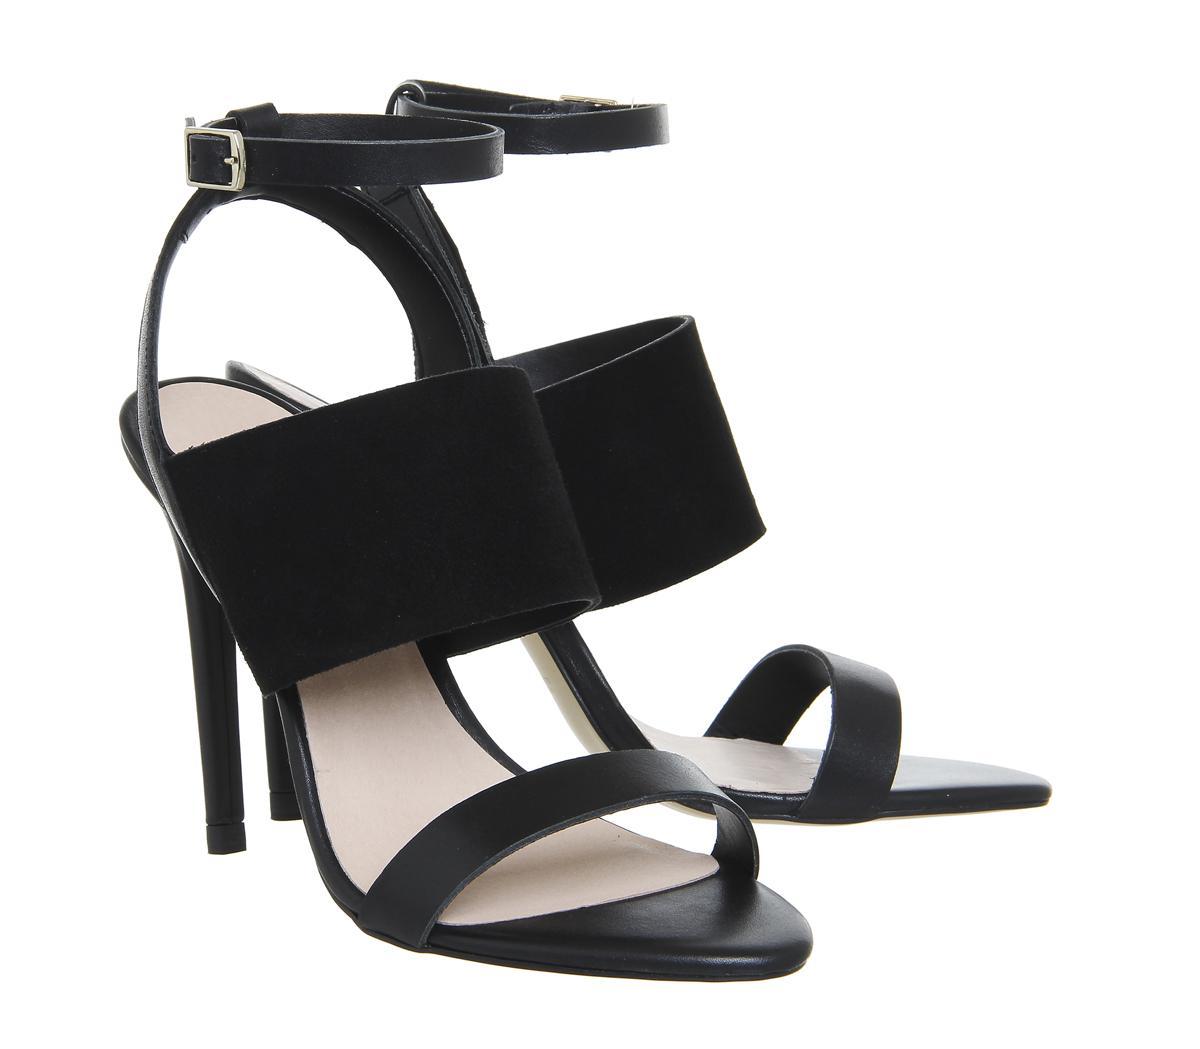 93cbd69b1ec Lyst - Office Anchor 3 Strap Heels in Black